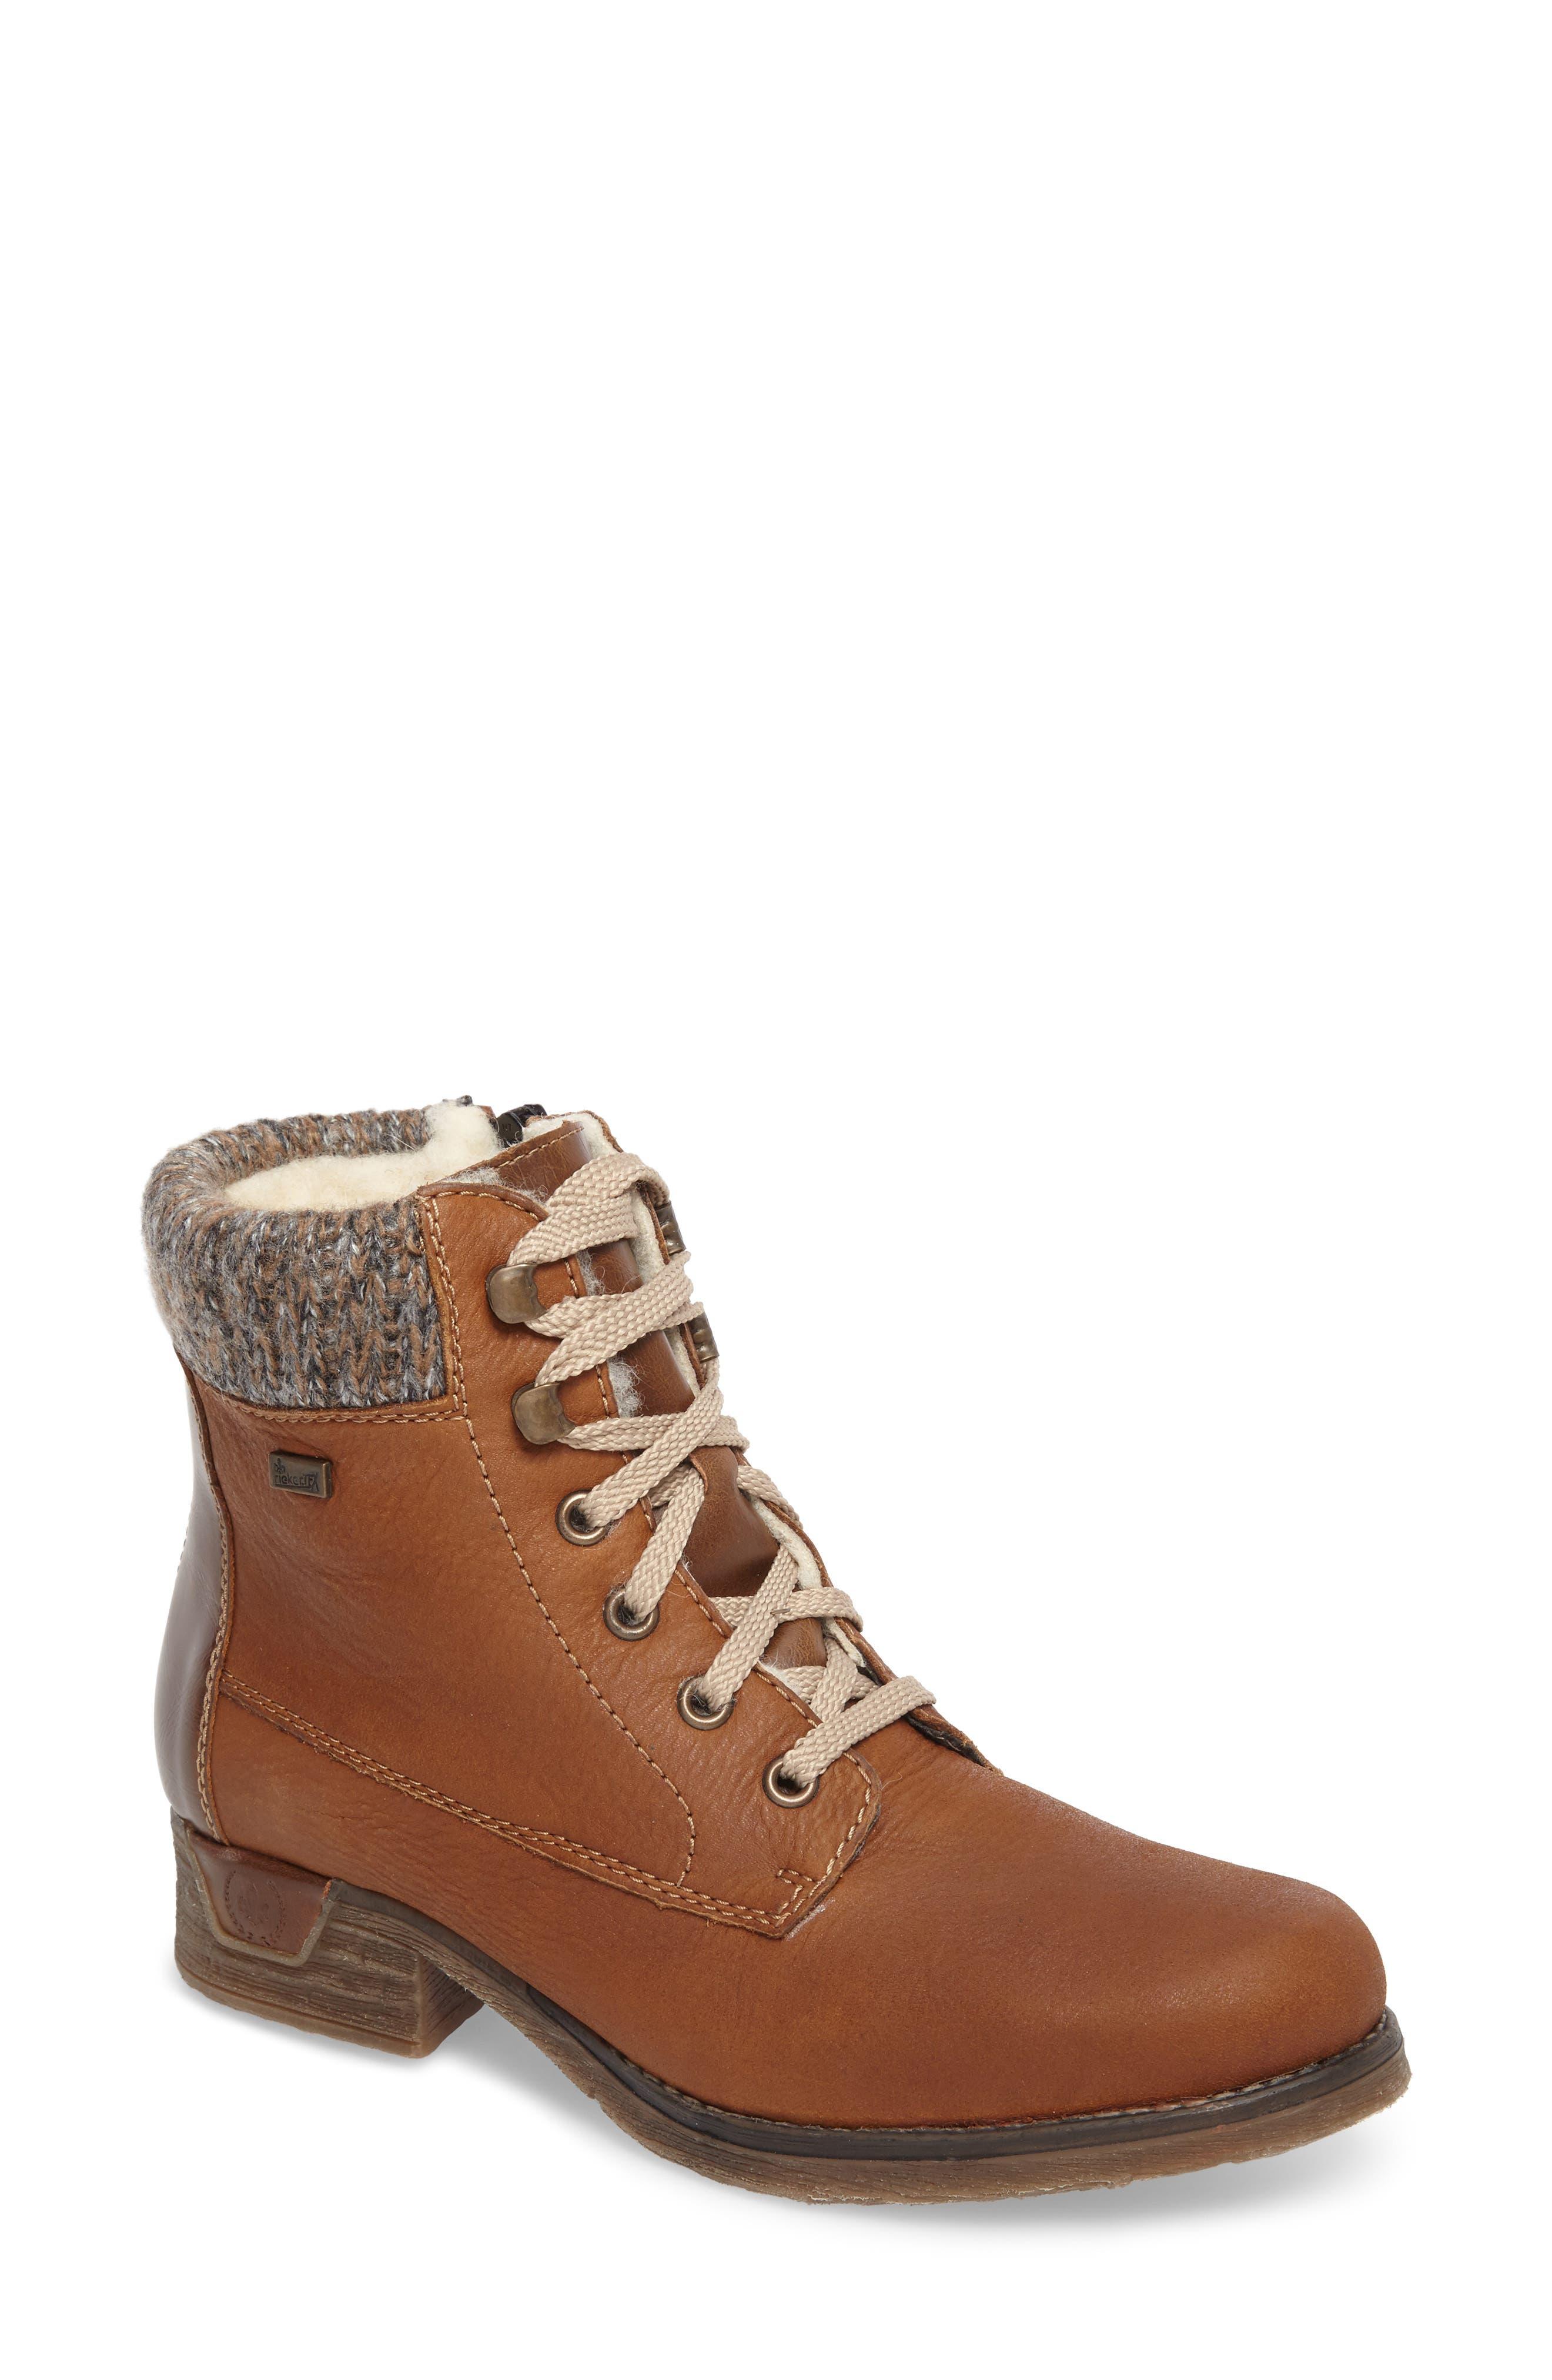 Main Image - Rieker Antistress Fee 02 Lace-Up Boot (Women)